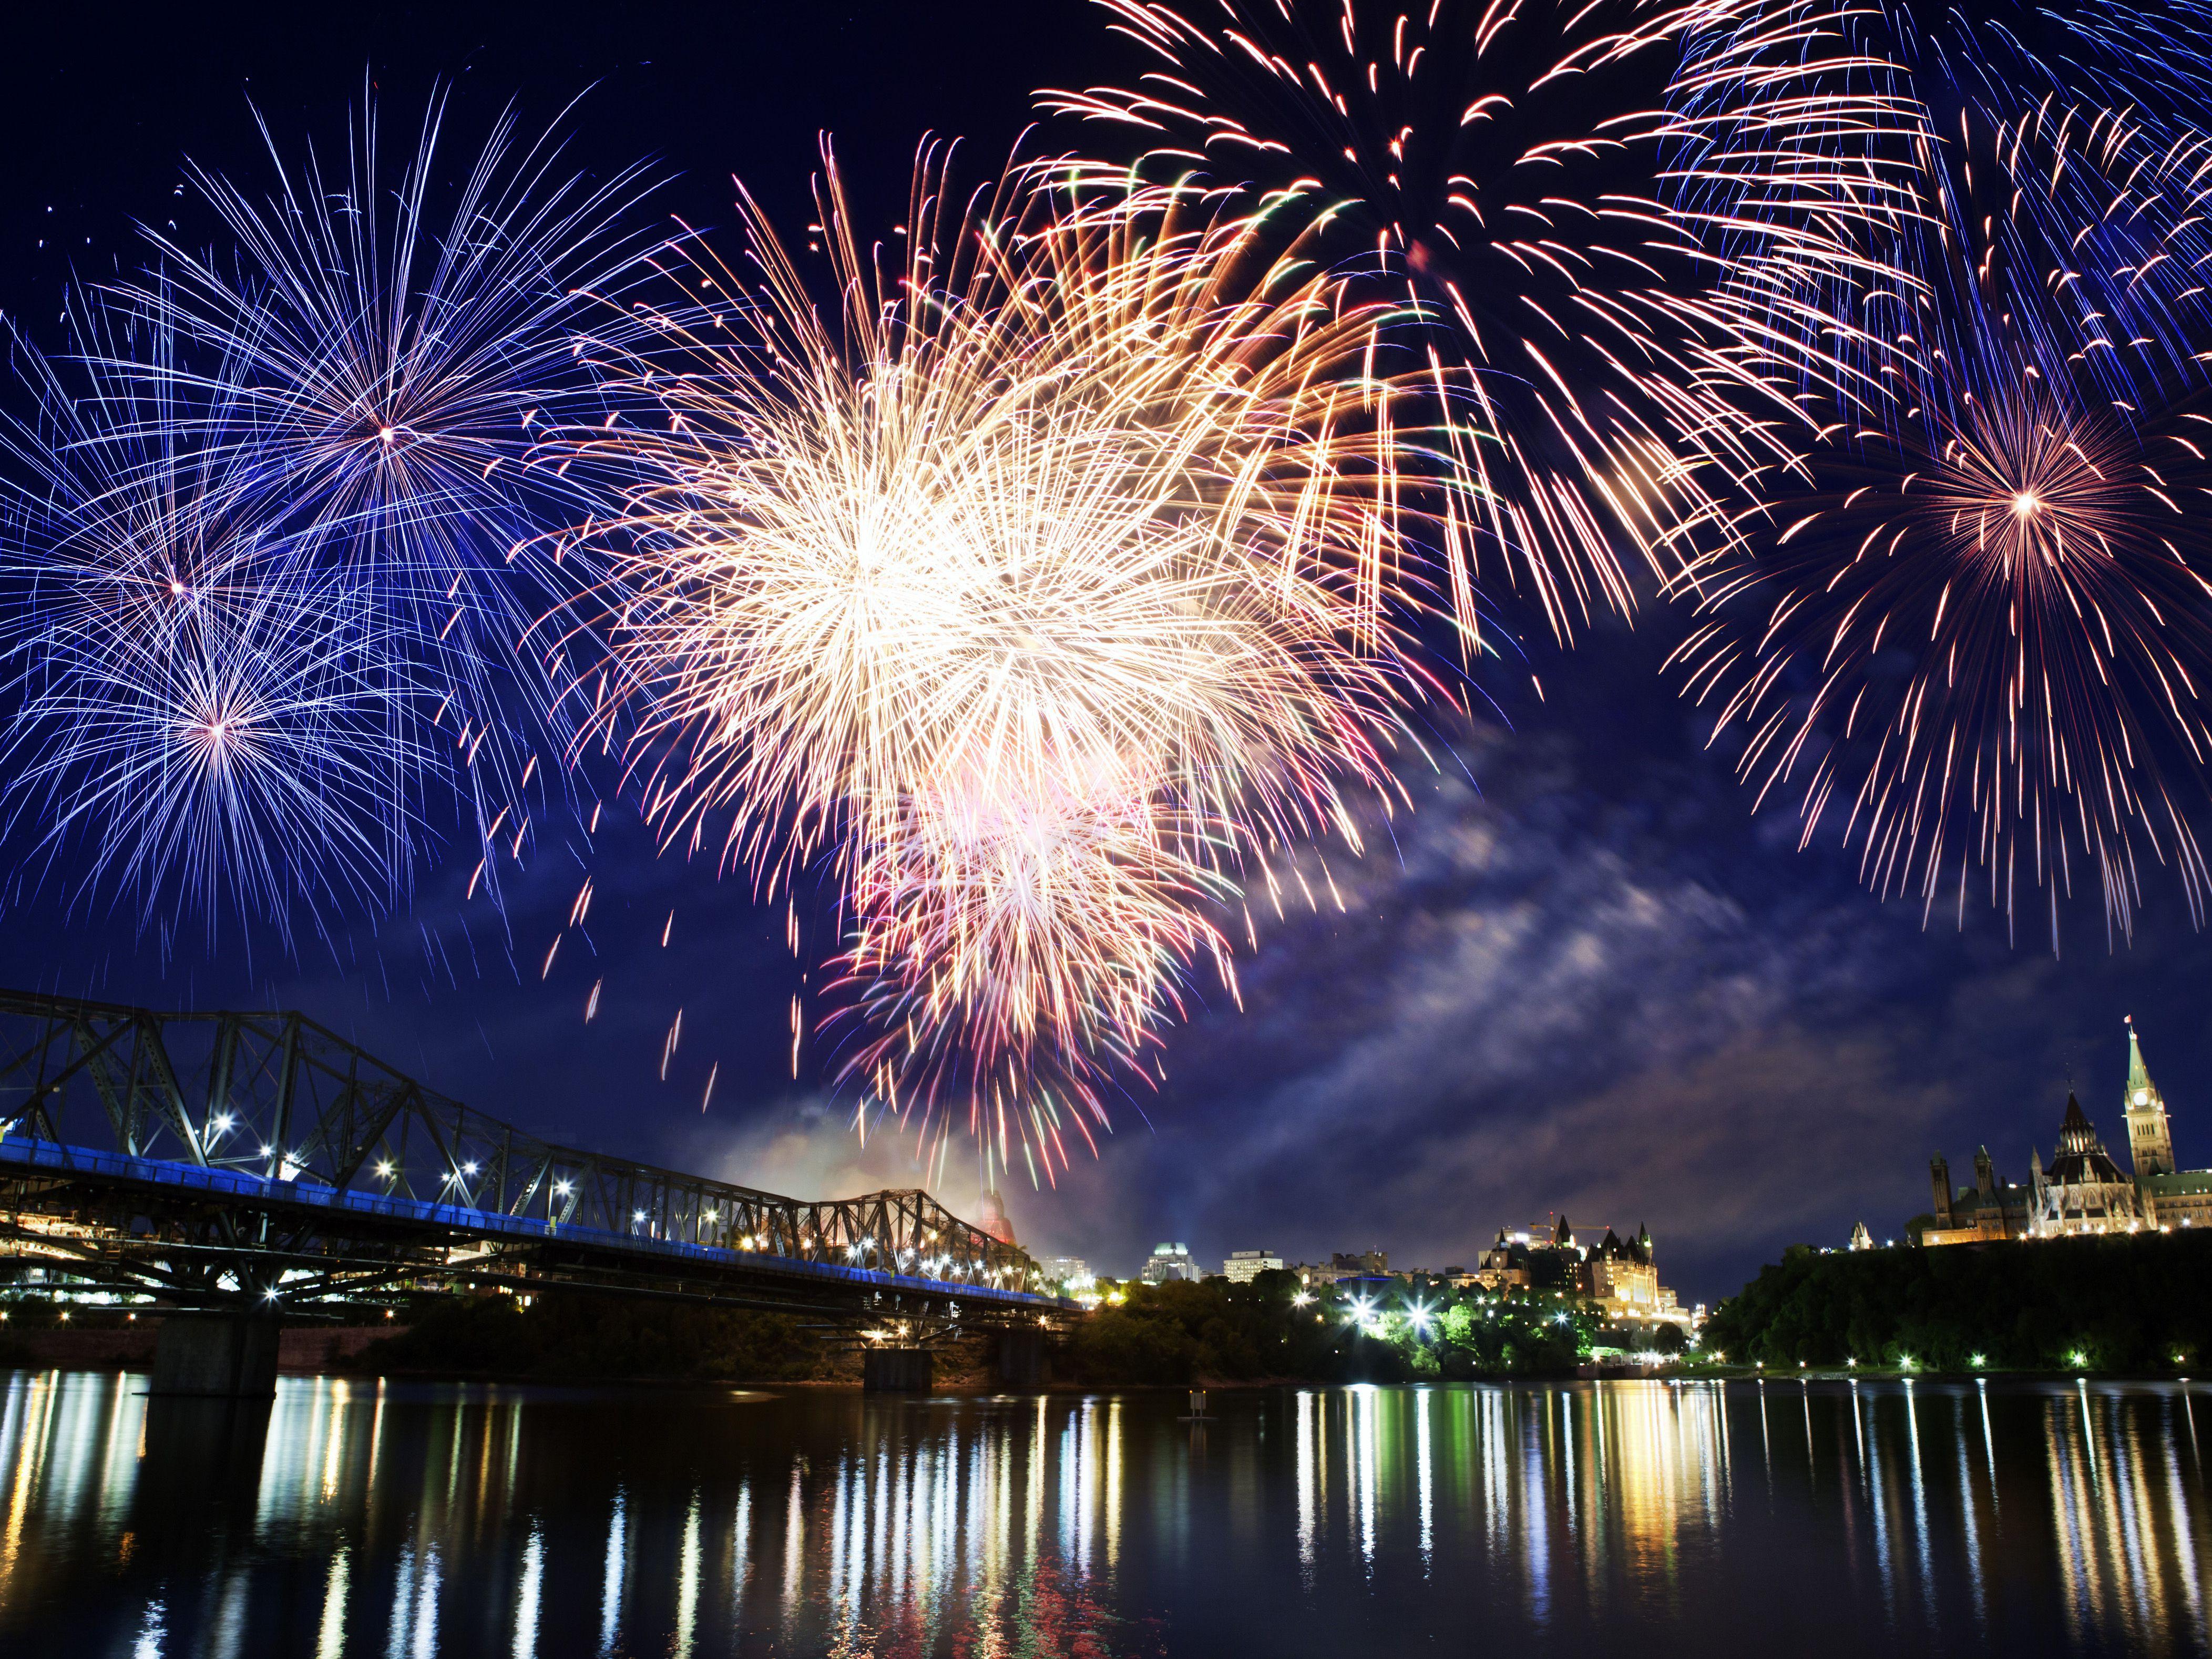 Canada Day 2019: How to Celebrate Canada's Birthday